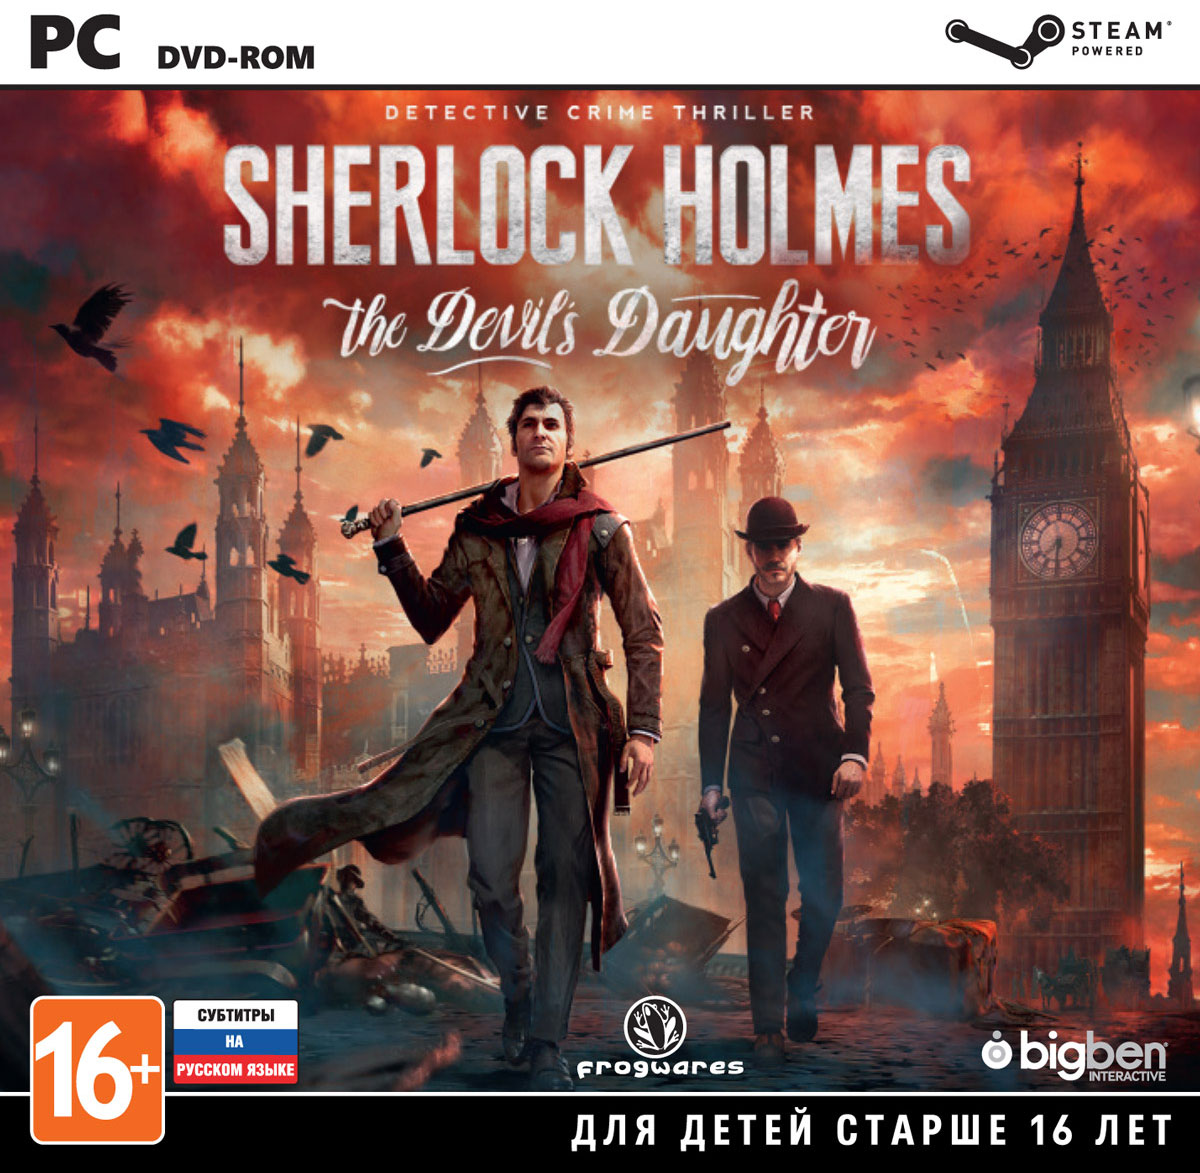 Sherlock Holmes: The Devil's Daughter dayle a c the adventures of sherlock holmes рассказы на английском языке